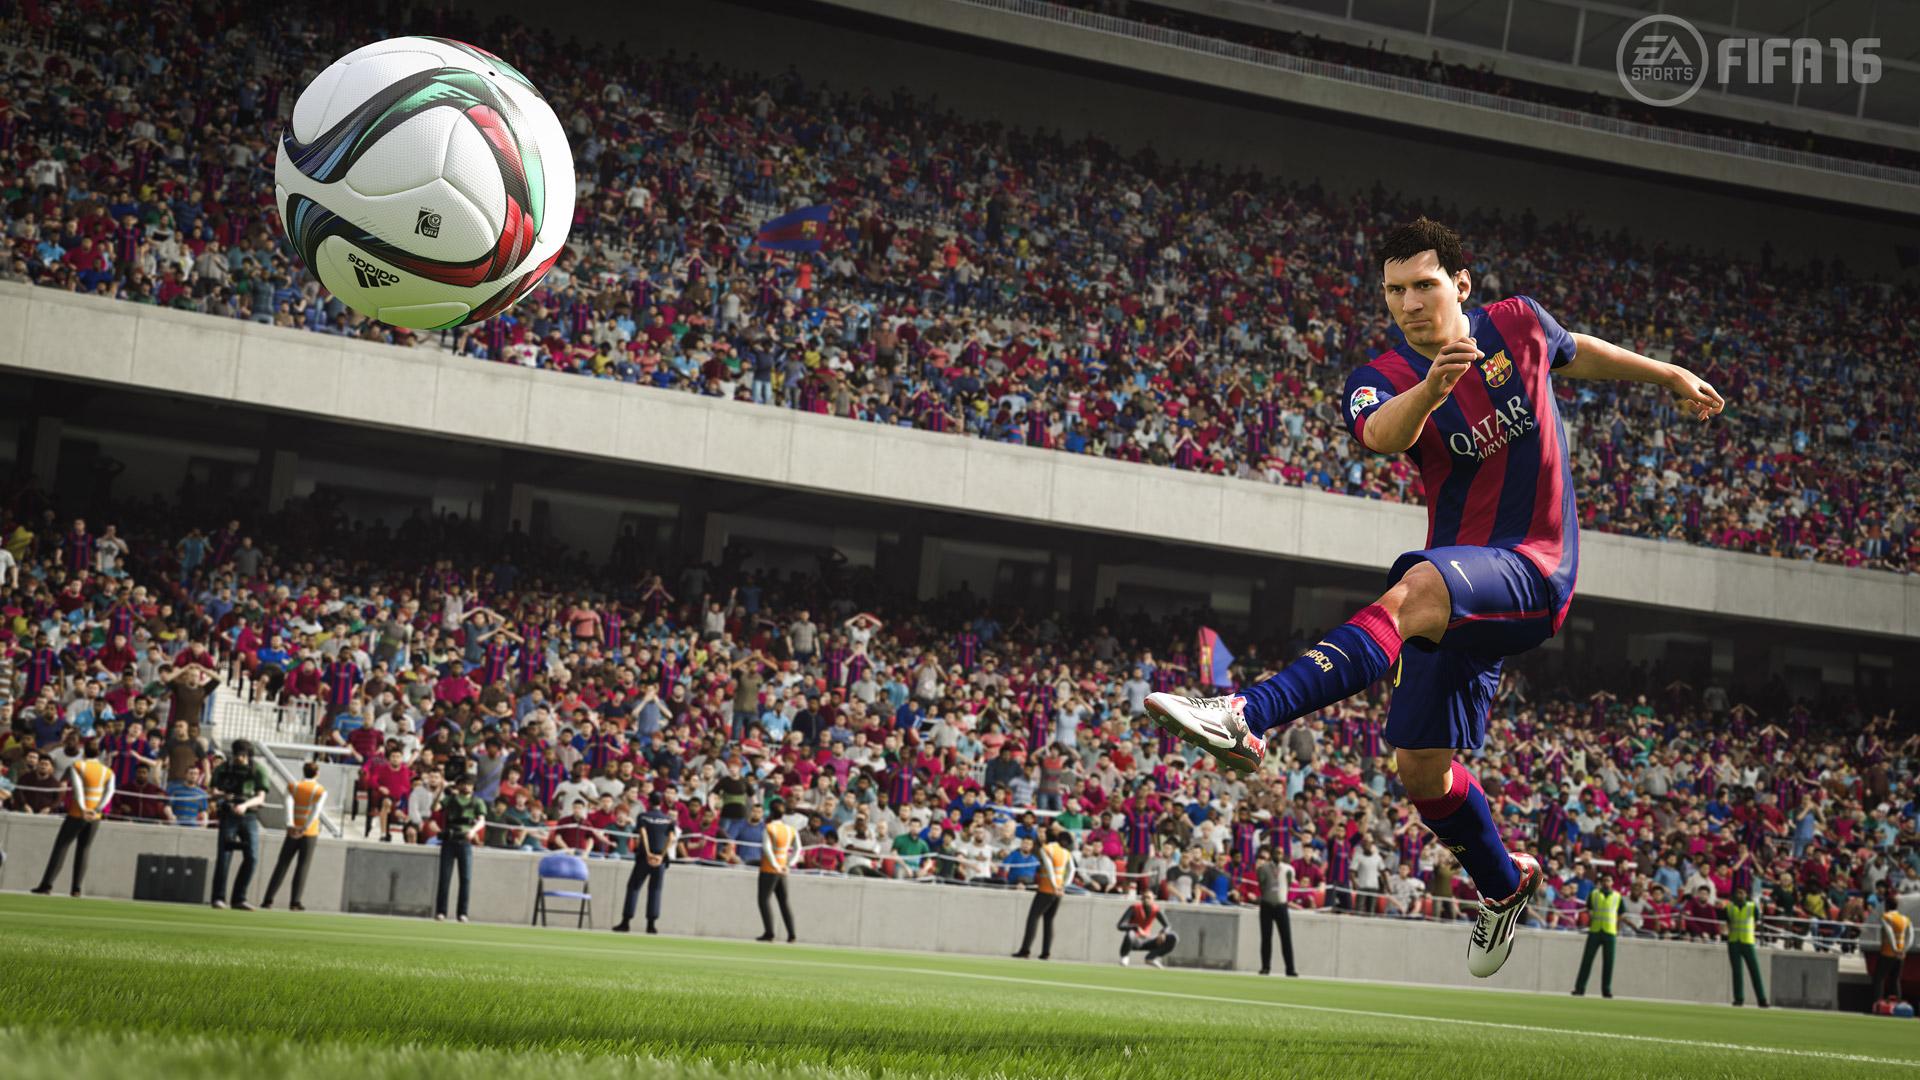 FIFA 16 Wallpaper in 1920x1080